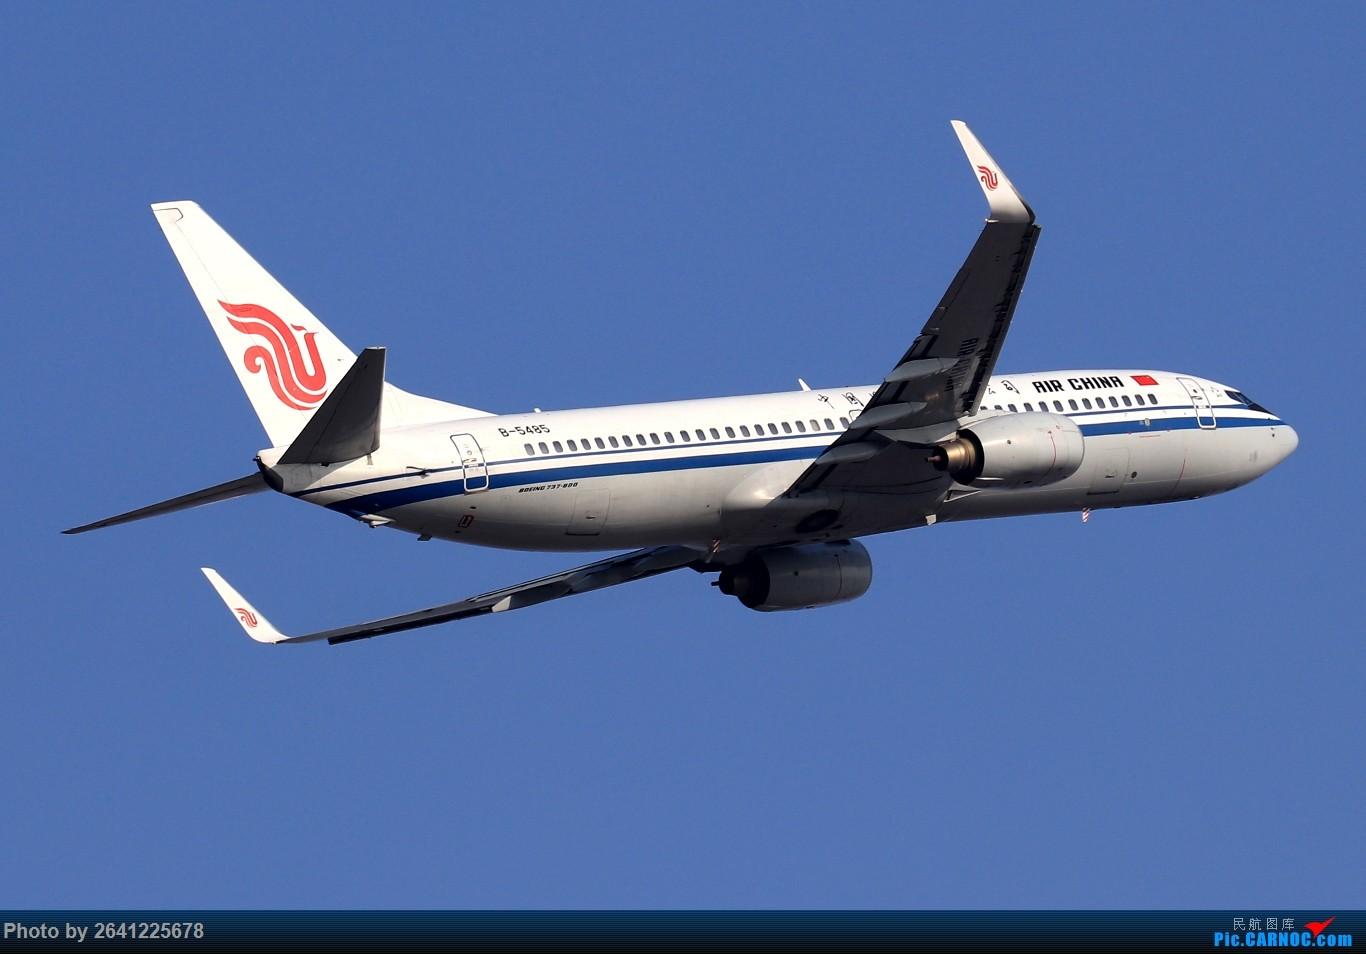 Re:[原创]【TSN】天津滨海国际机场半日游(按注册号1~9发图) BOEING 737-800 B-5485 中国天津滨海国际机场